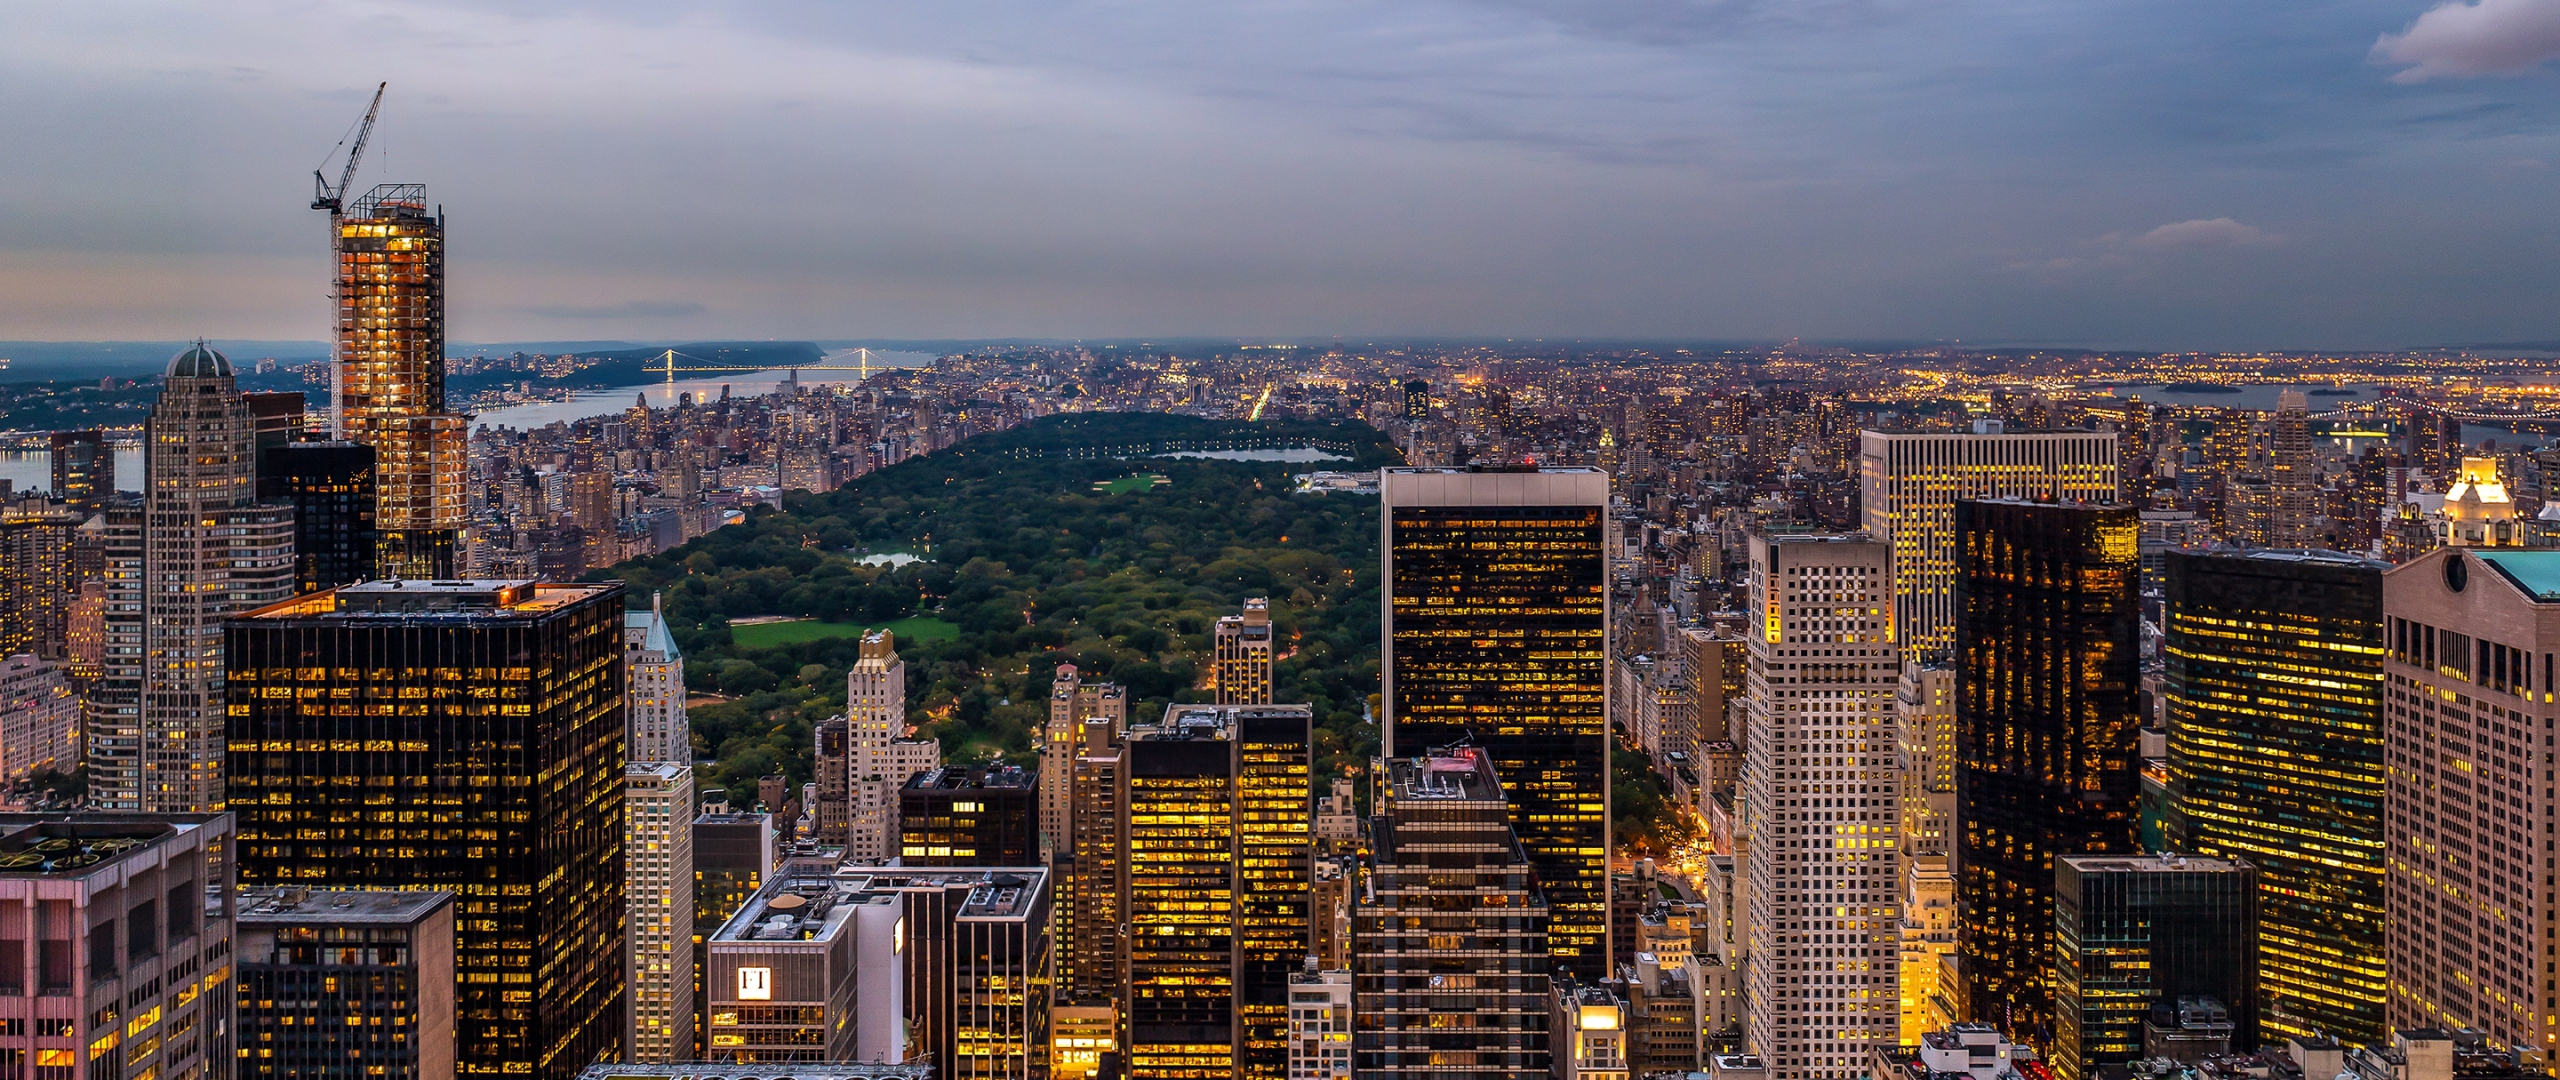 Download Wallpaper 2560x1080 Usa New york state New york 2560x1080